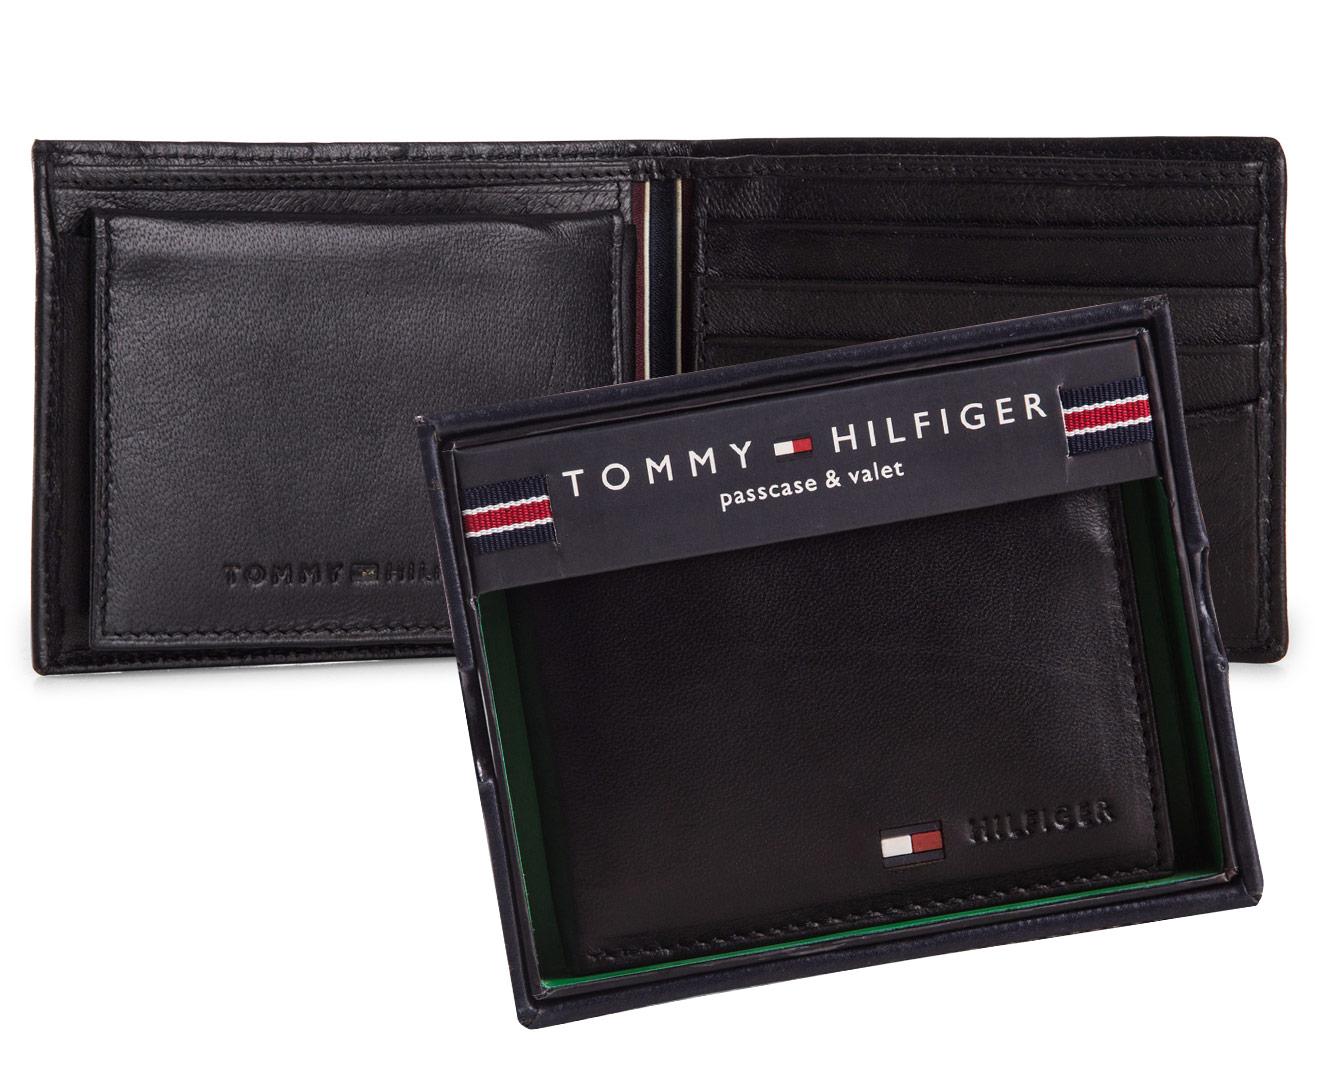 Tommy Hilfiger Men/'s Genuine Leather Bifold Wallet with Valet Case 31TL22X053